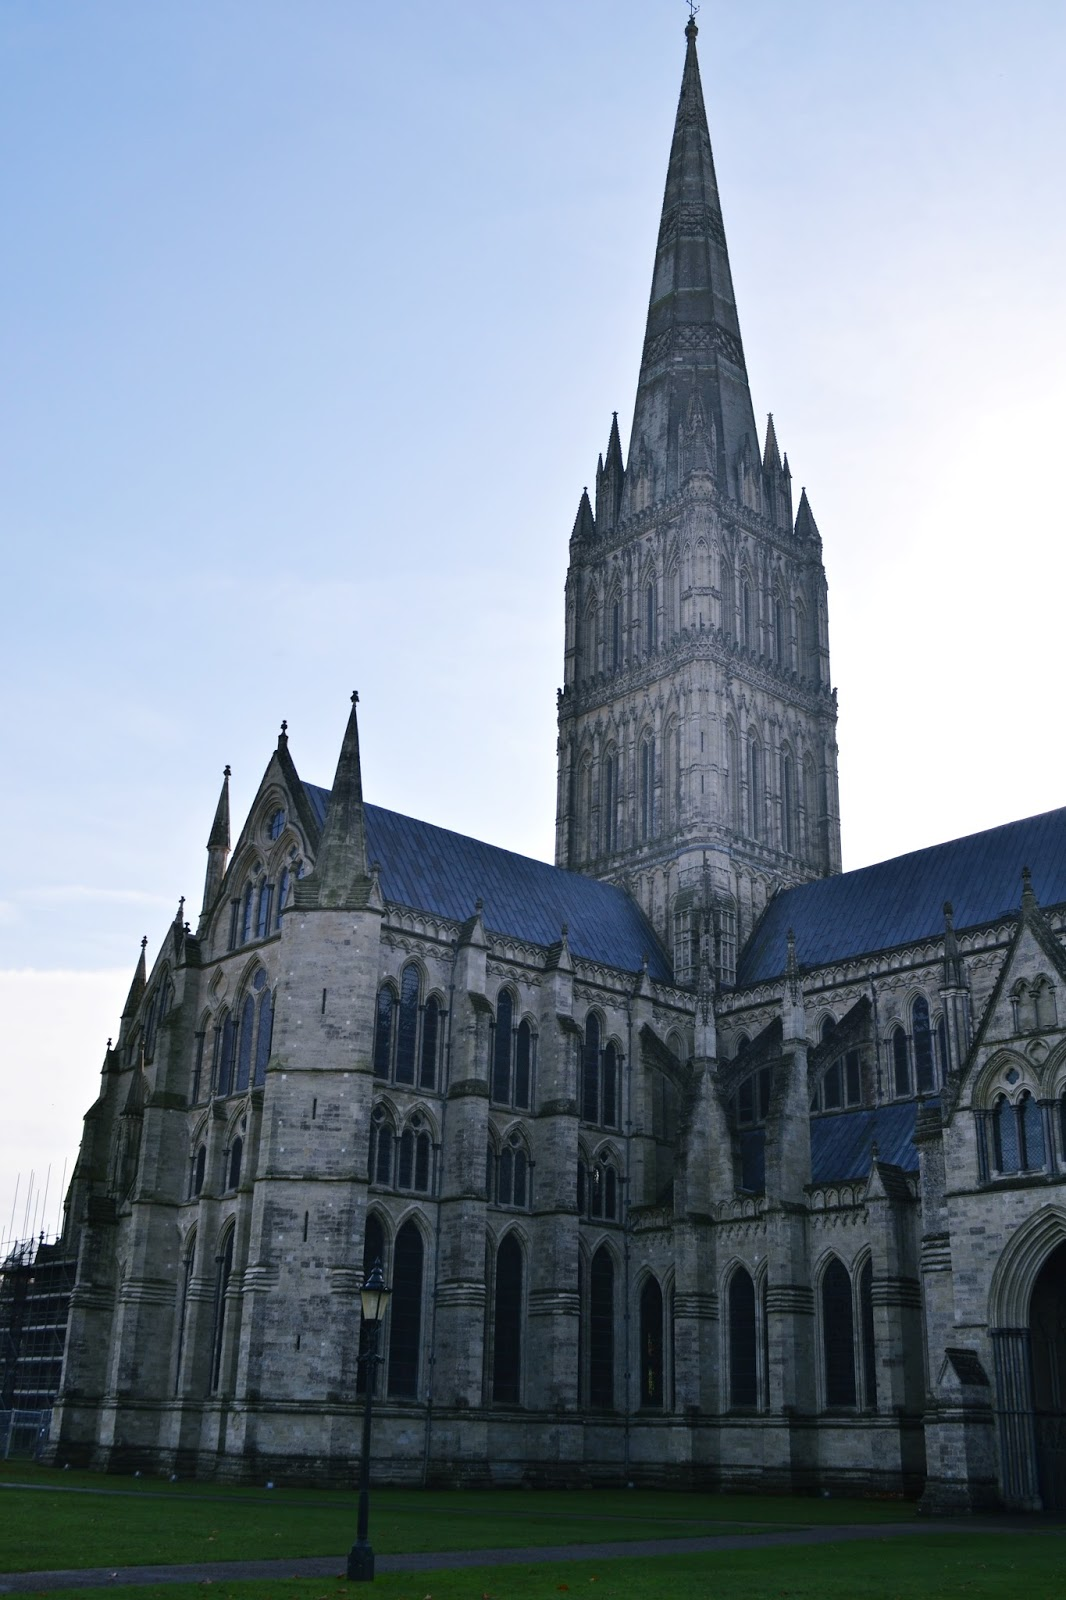 salisbury cathedral - photo #27